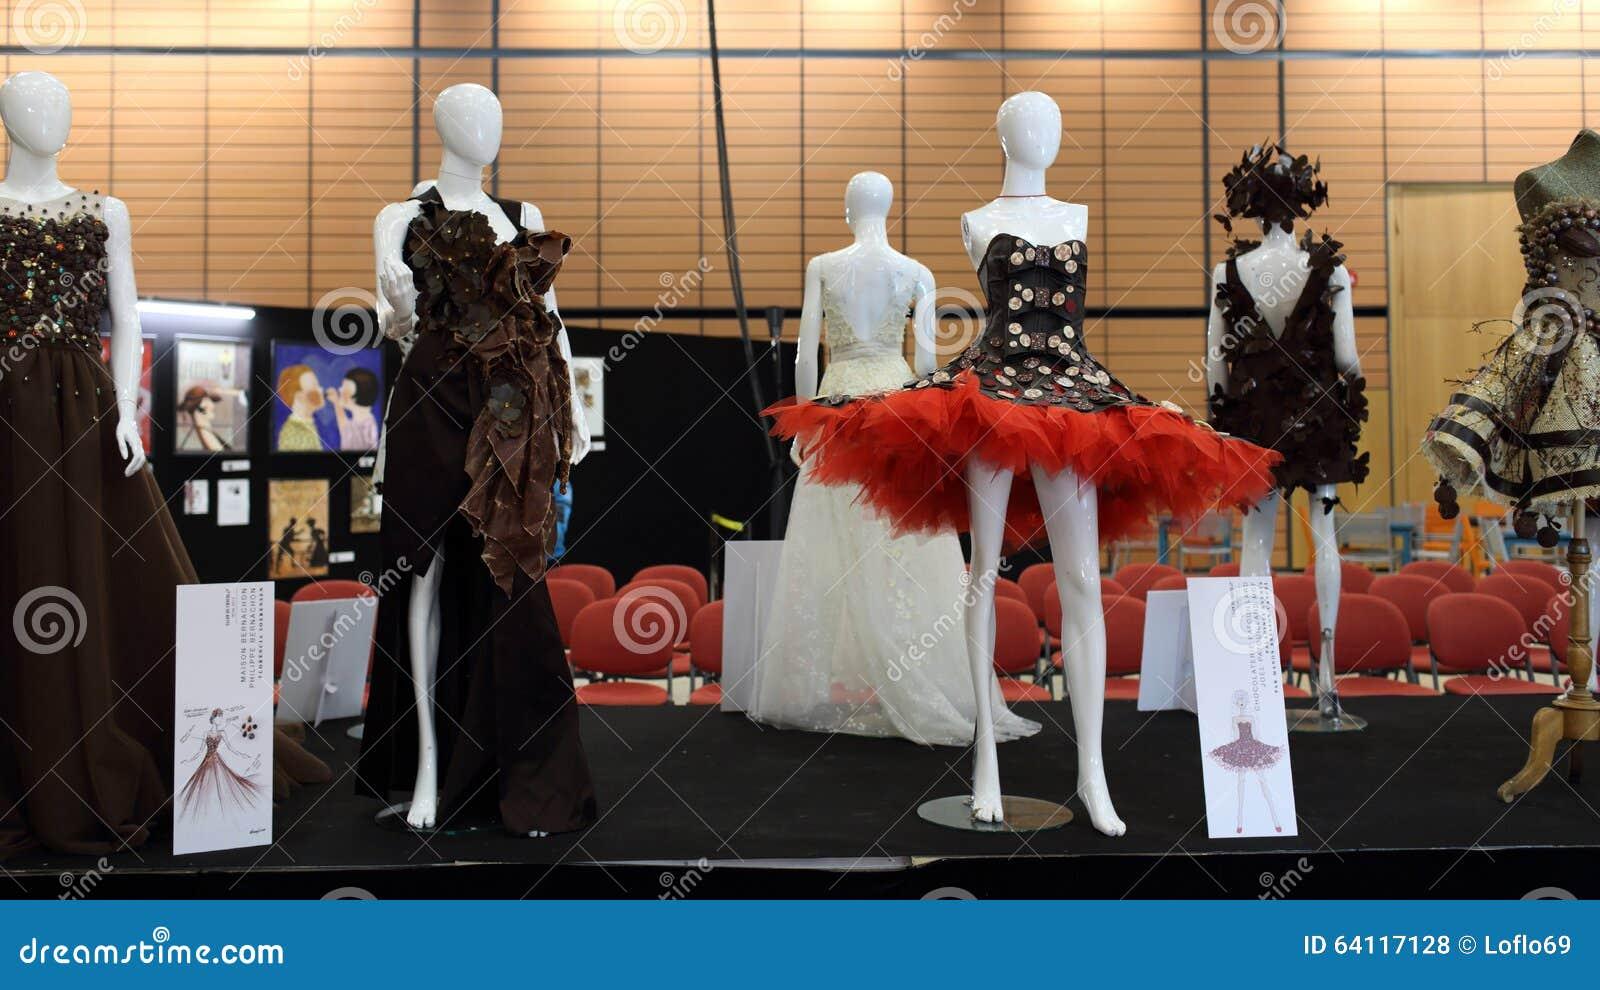 Salon du chocolat 2015 chocolate dress editorial stock for Salon du x lyon